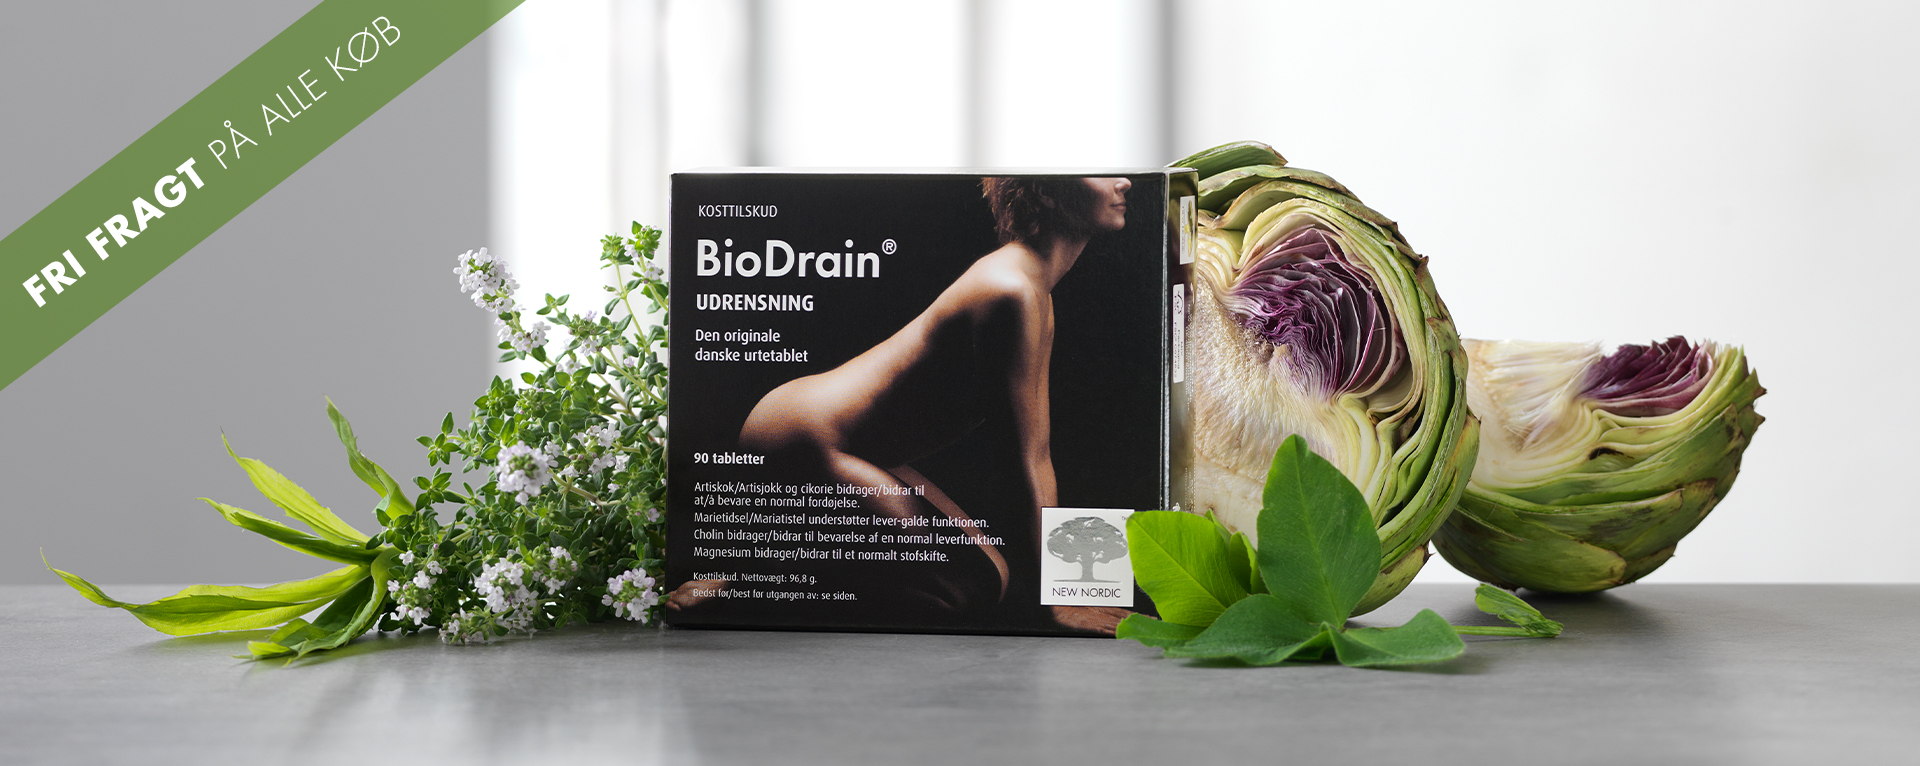 Biodrain